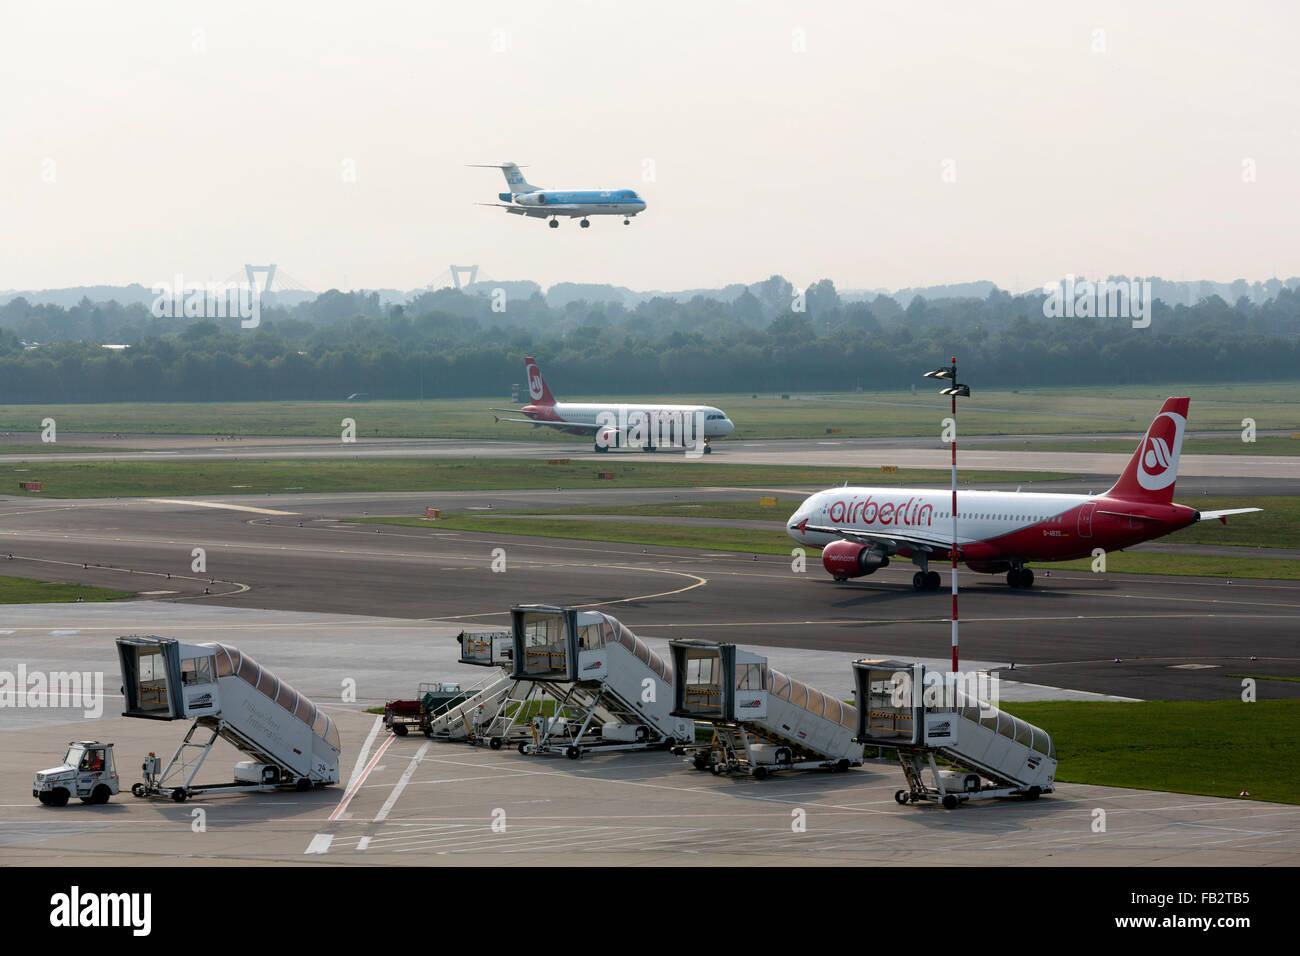 Düsseldorf, Flughafen - Stock Image